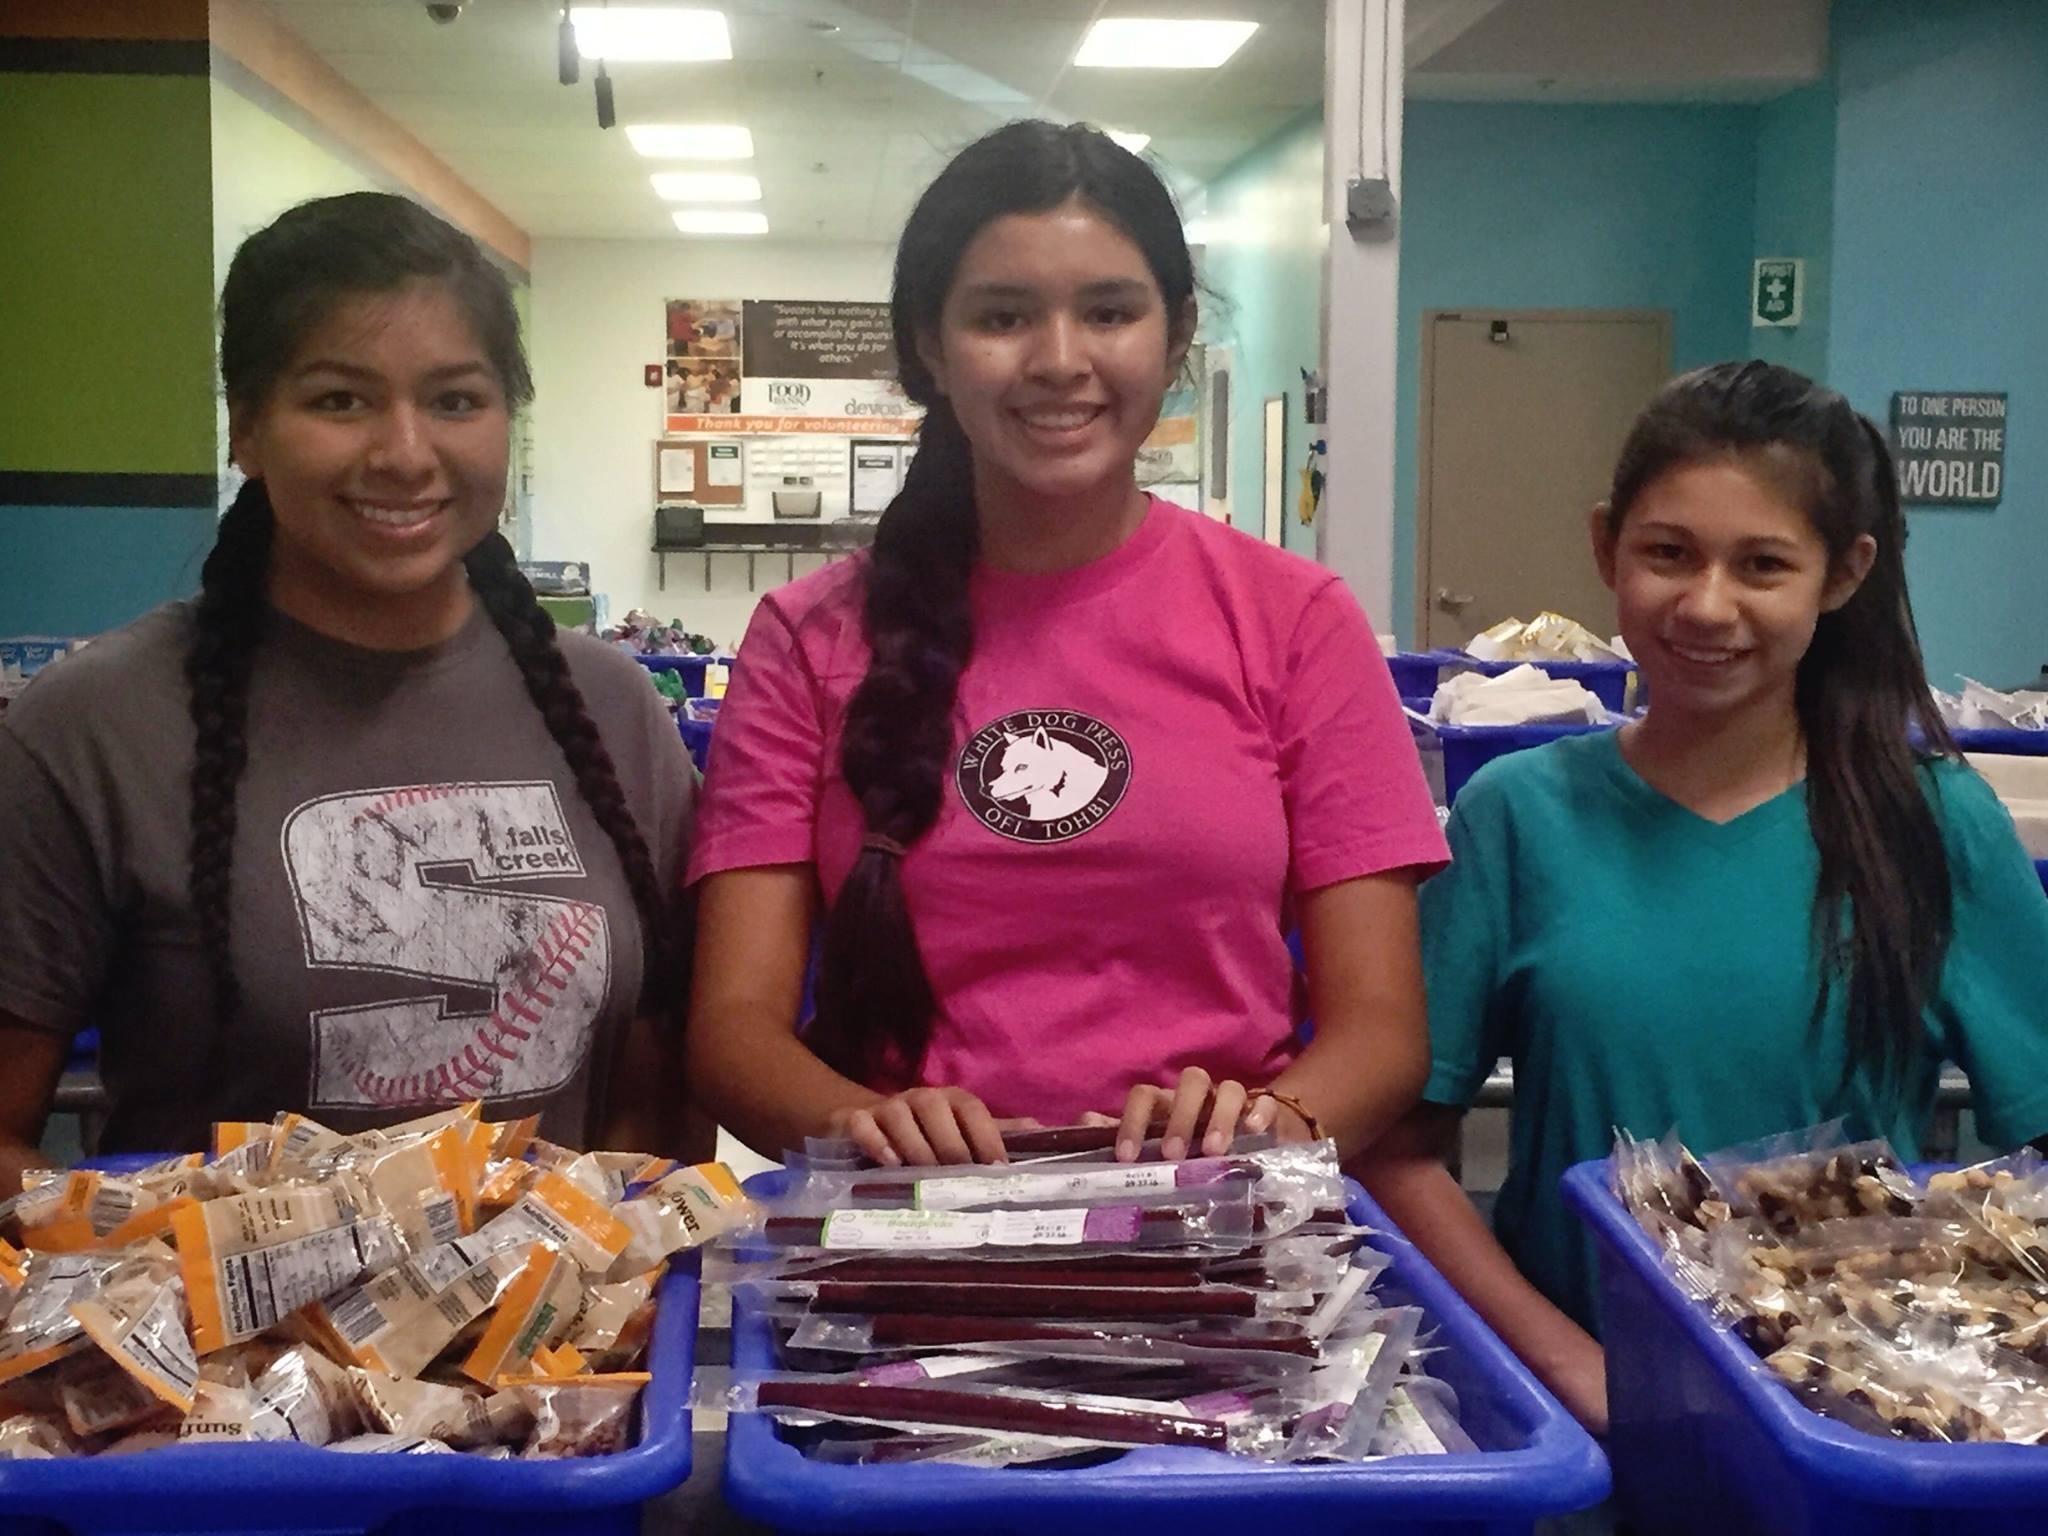 Family Volunteer Opportunities In The Okc Metro Metrofamily Magazine